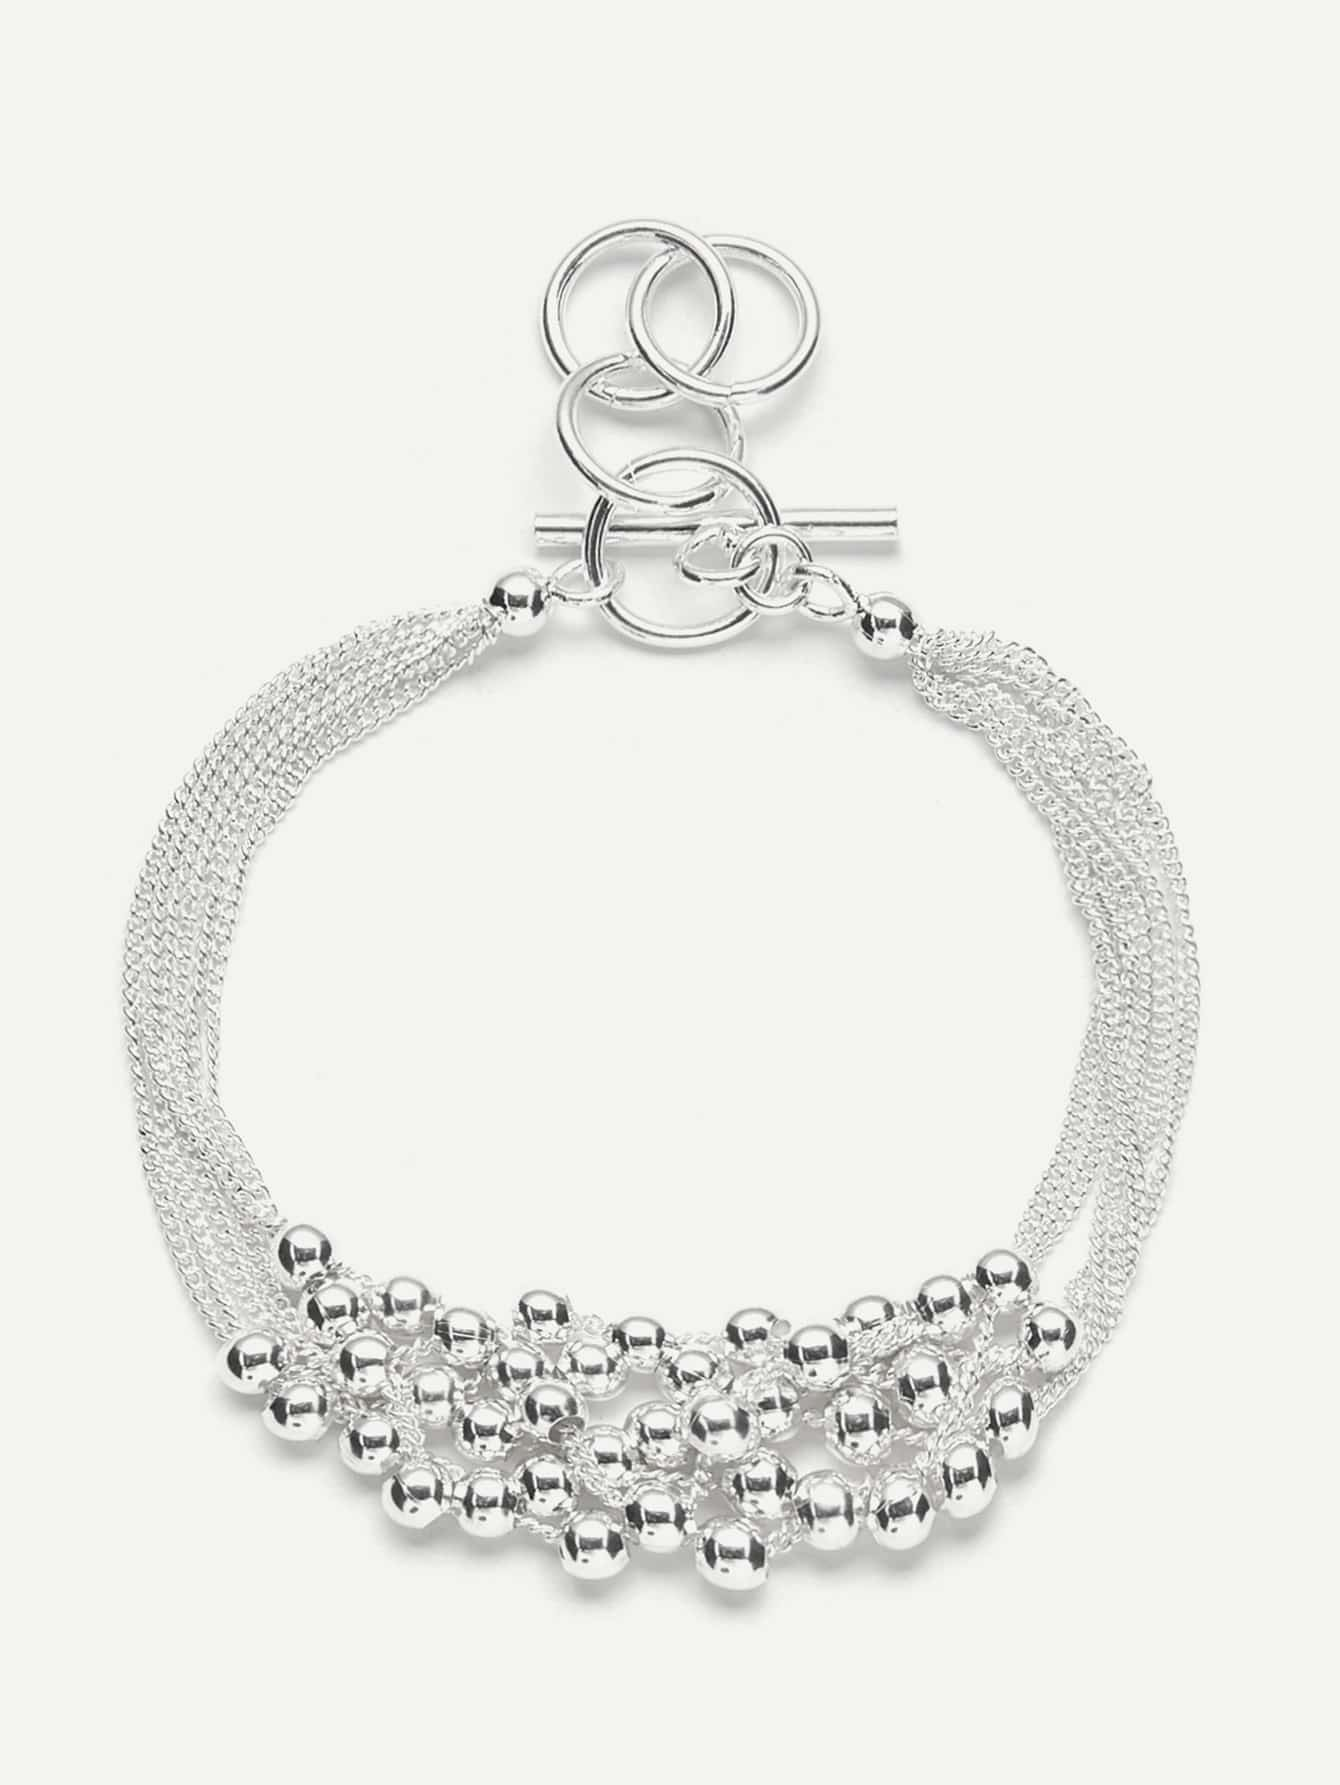 Metal Beaded Design Layered Chain Bracelet wing design chain bracelet